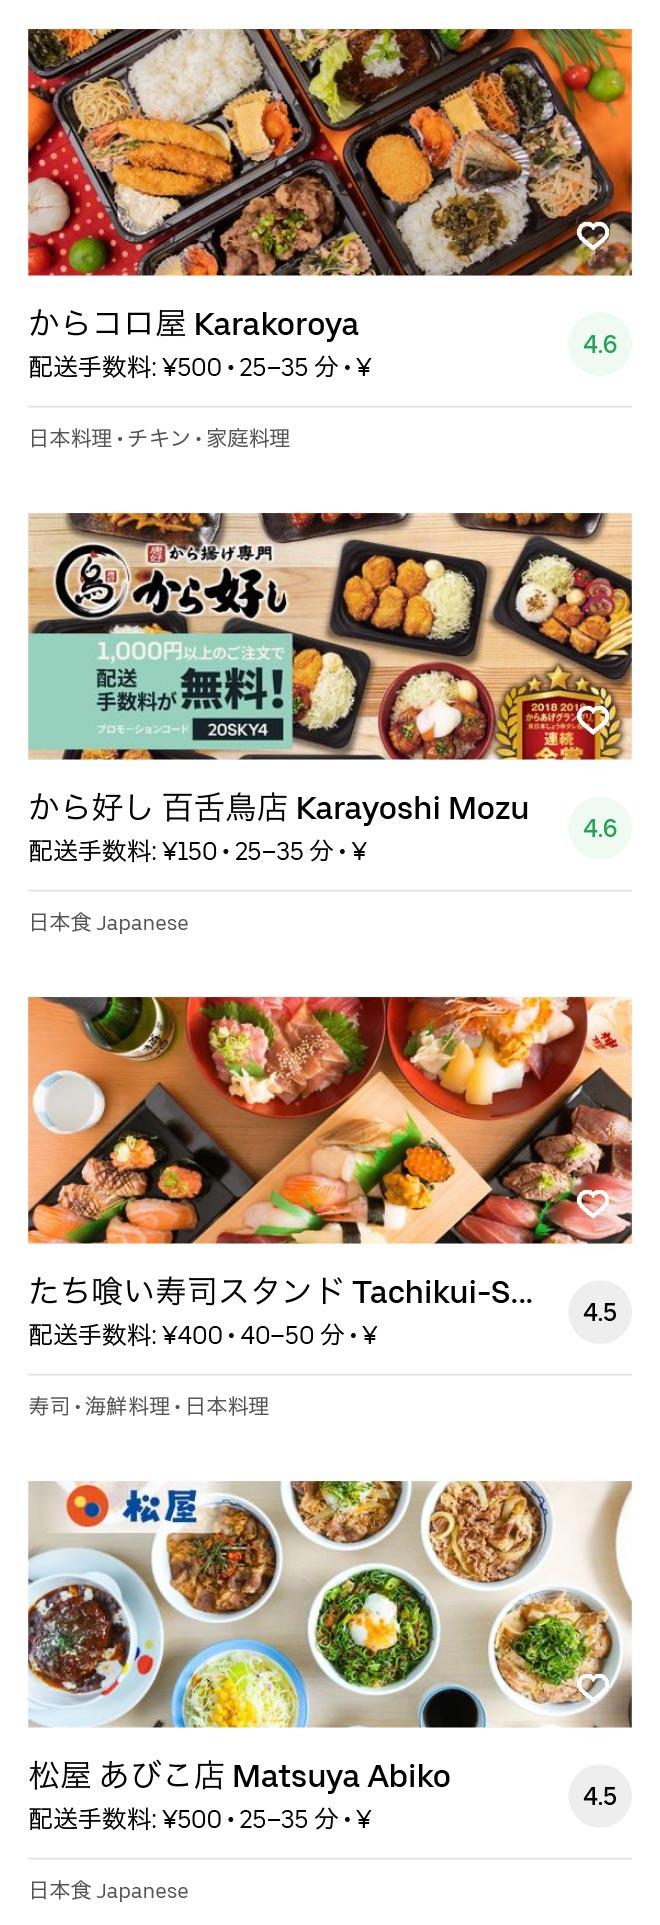 Sakai nakamozu menu 2005 06